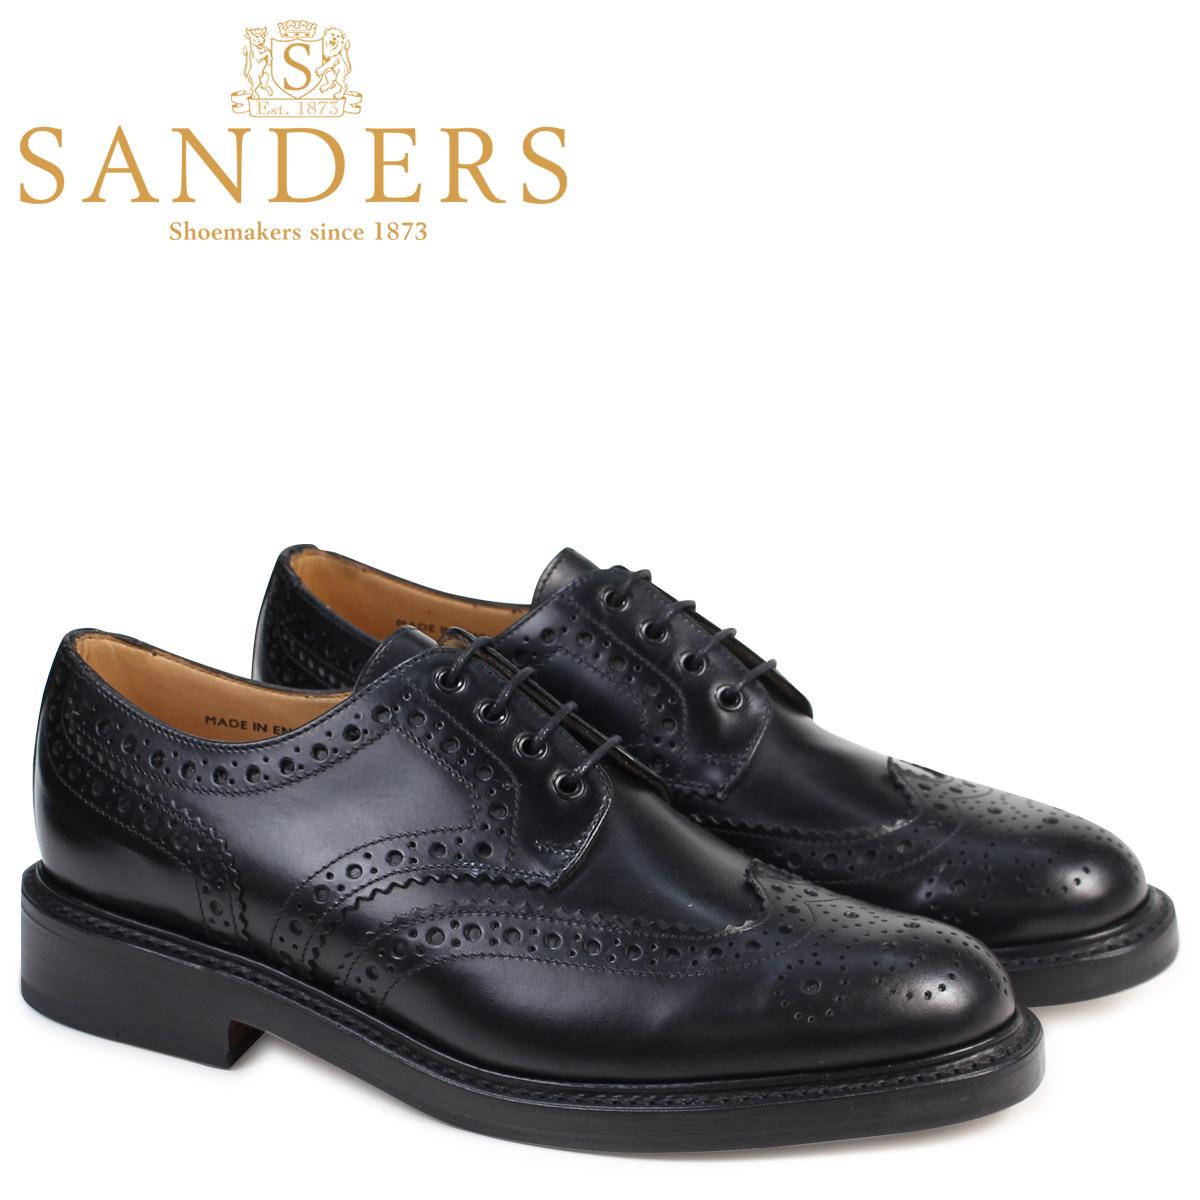 SANDERS FAKENHAM サンダース ミリタリー オックスフォード シューズ ウイングチップ メンズ ビジネス ブラック 9317B